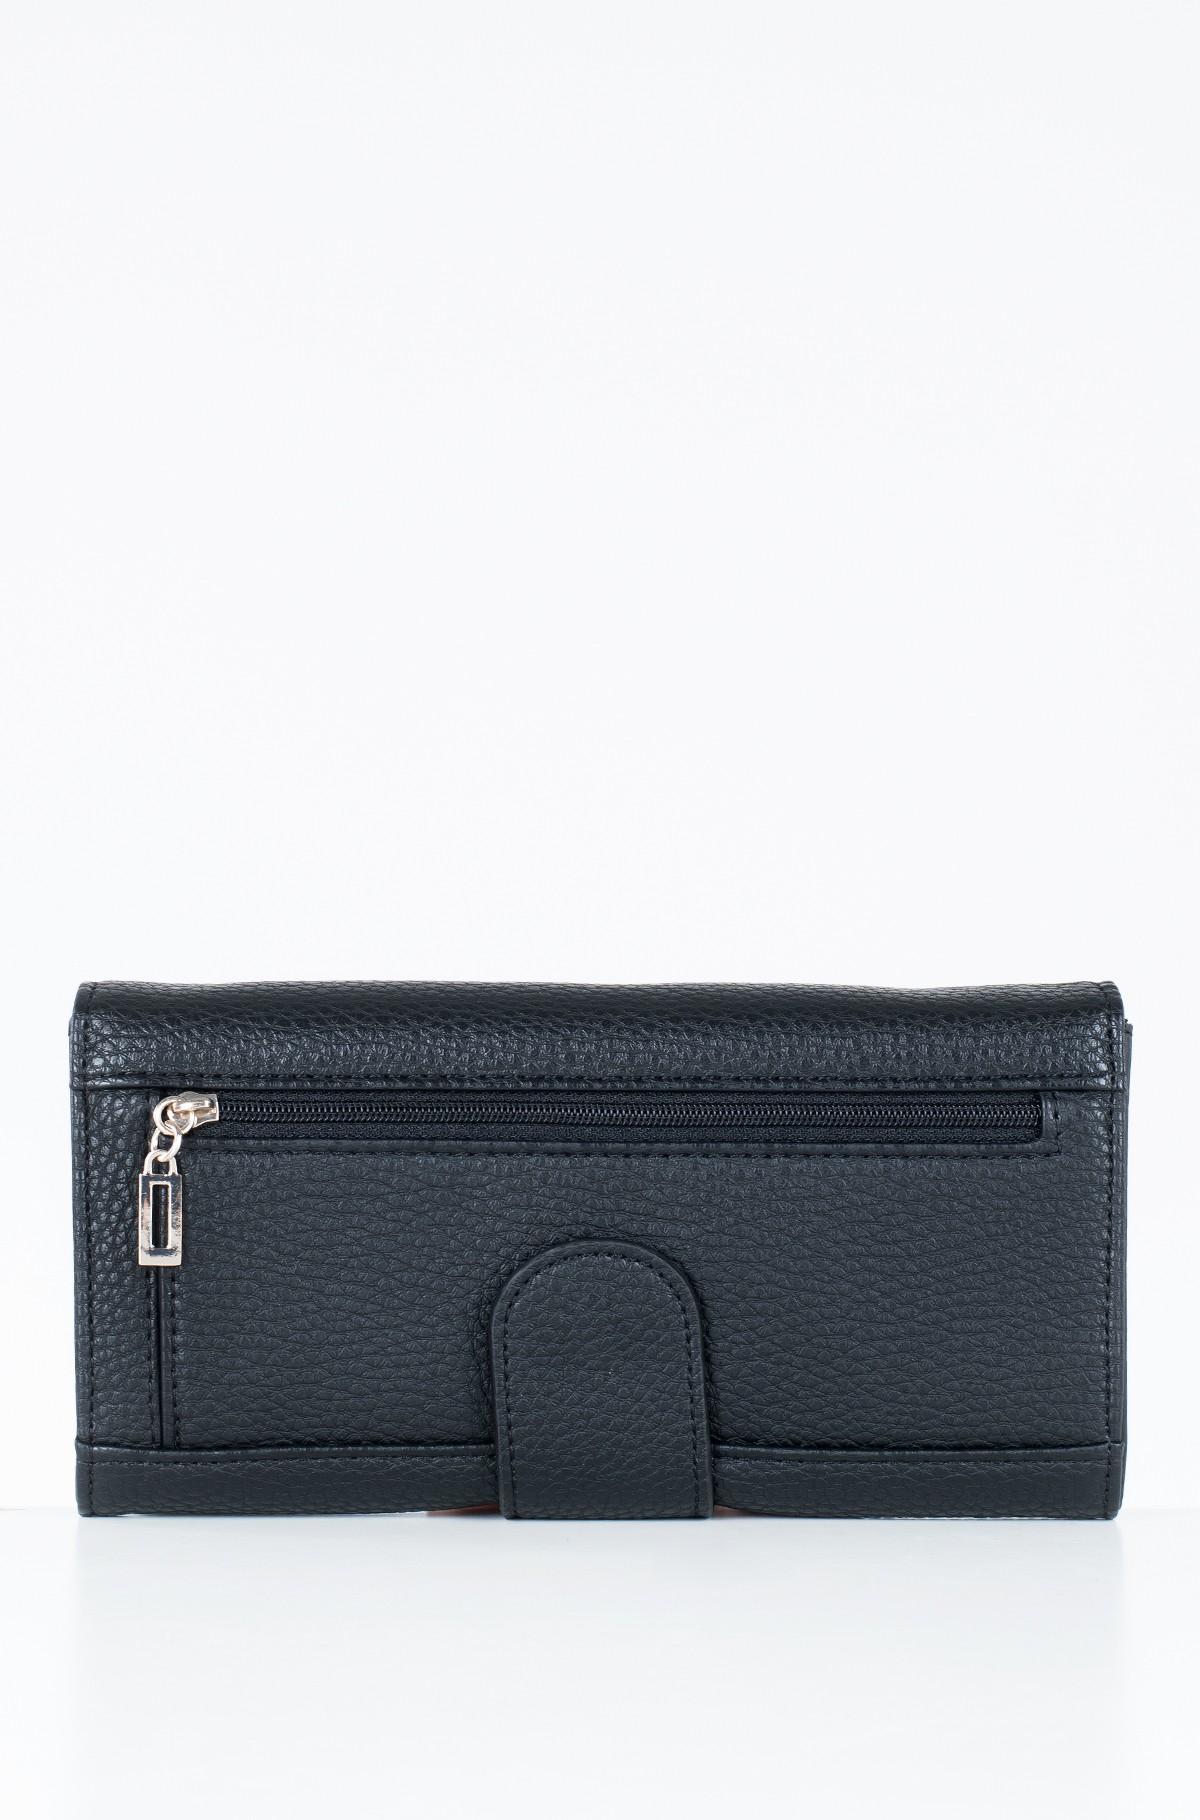 Wallet SWVG74 39590-full-2